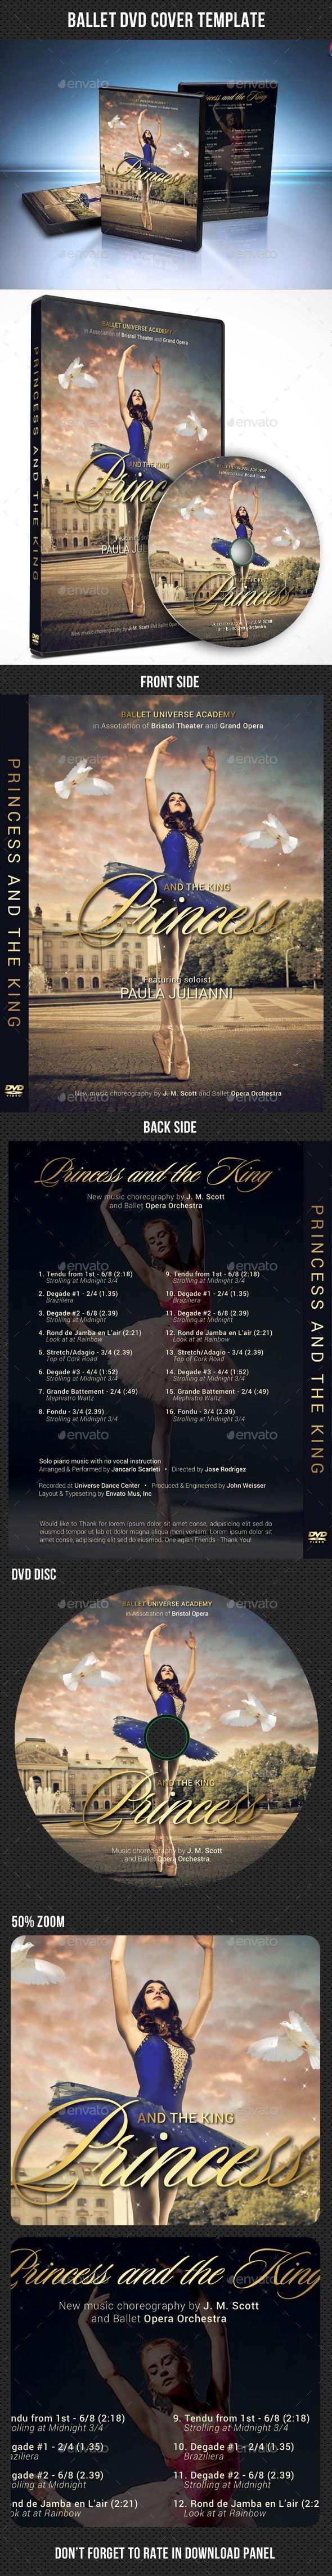 Ballet DVD Cover Template - #CD & DVD Artwork Print Templates